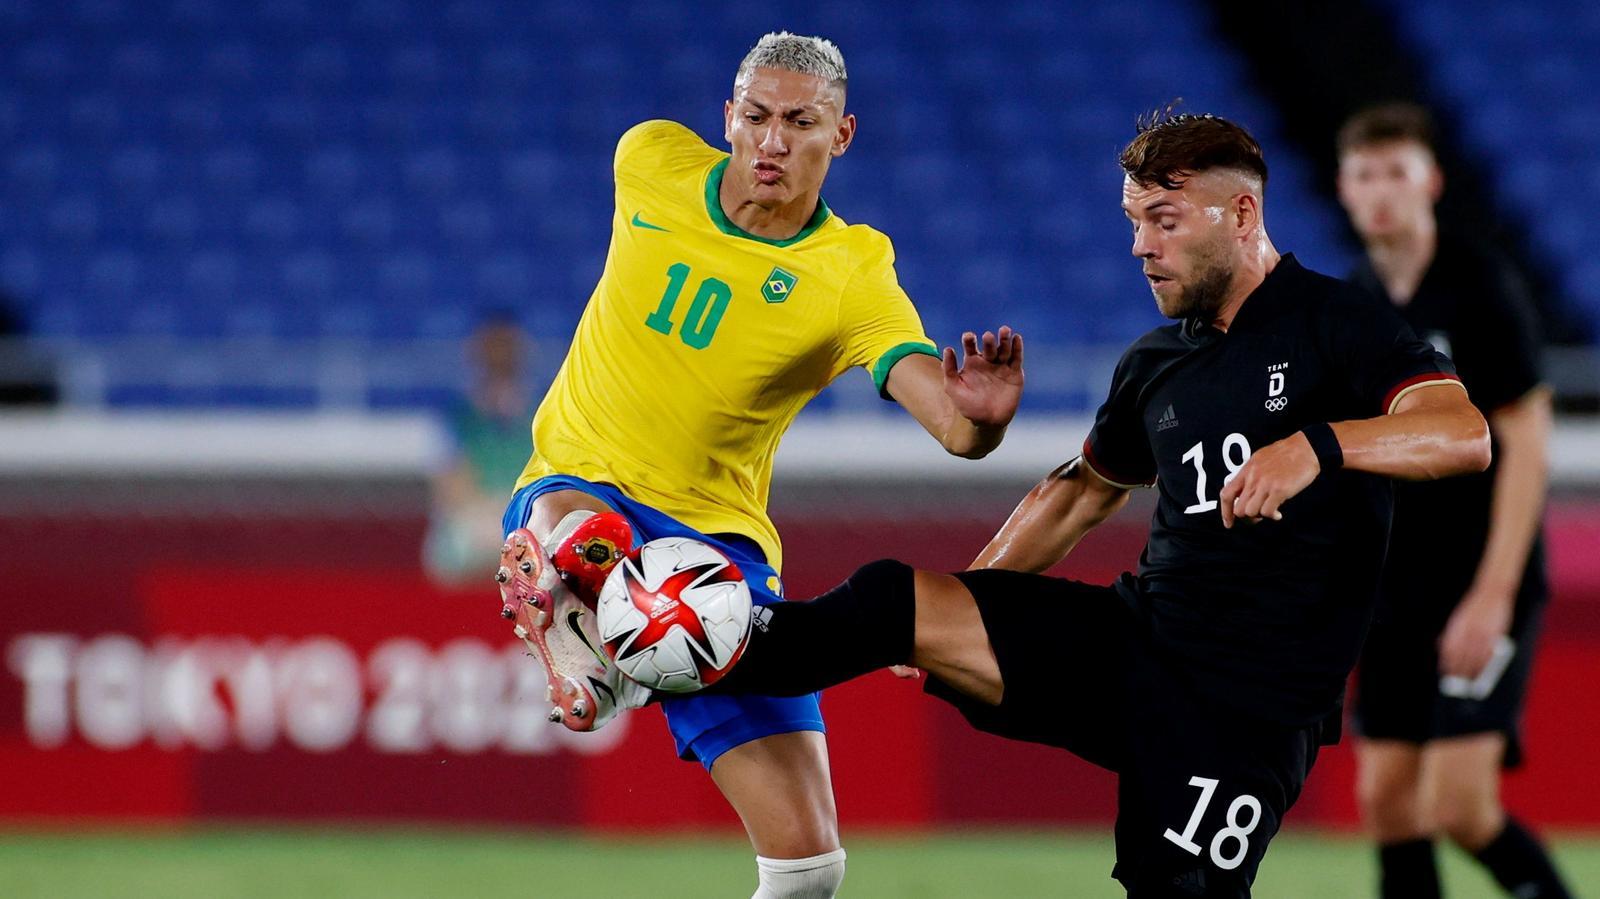 Olympics-Soccer-Richarlison hits hat-trick as Brazil beat Germany